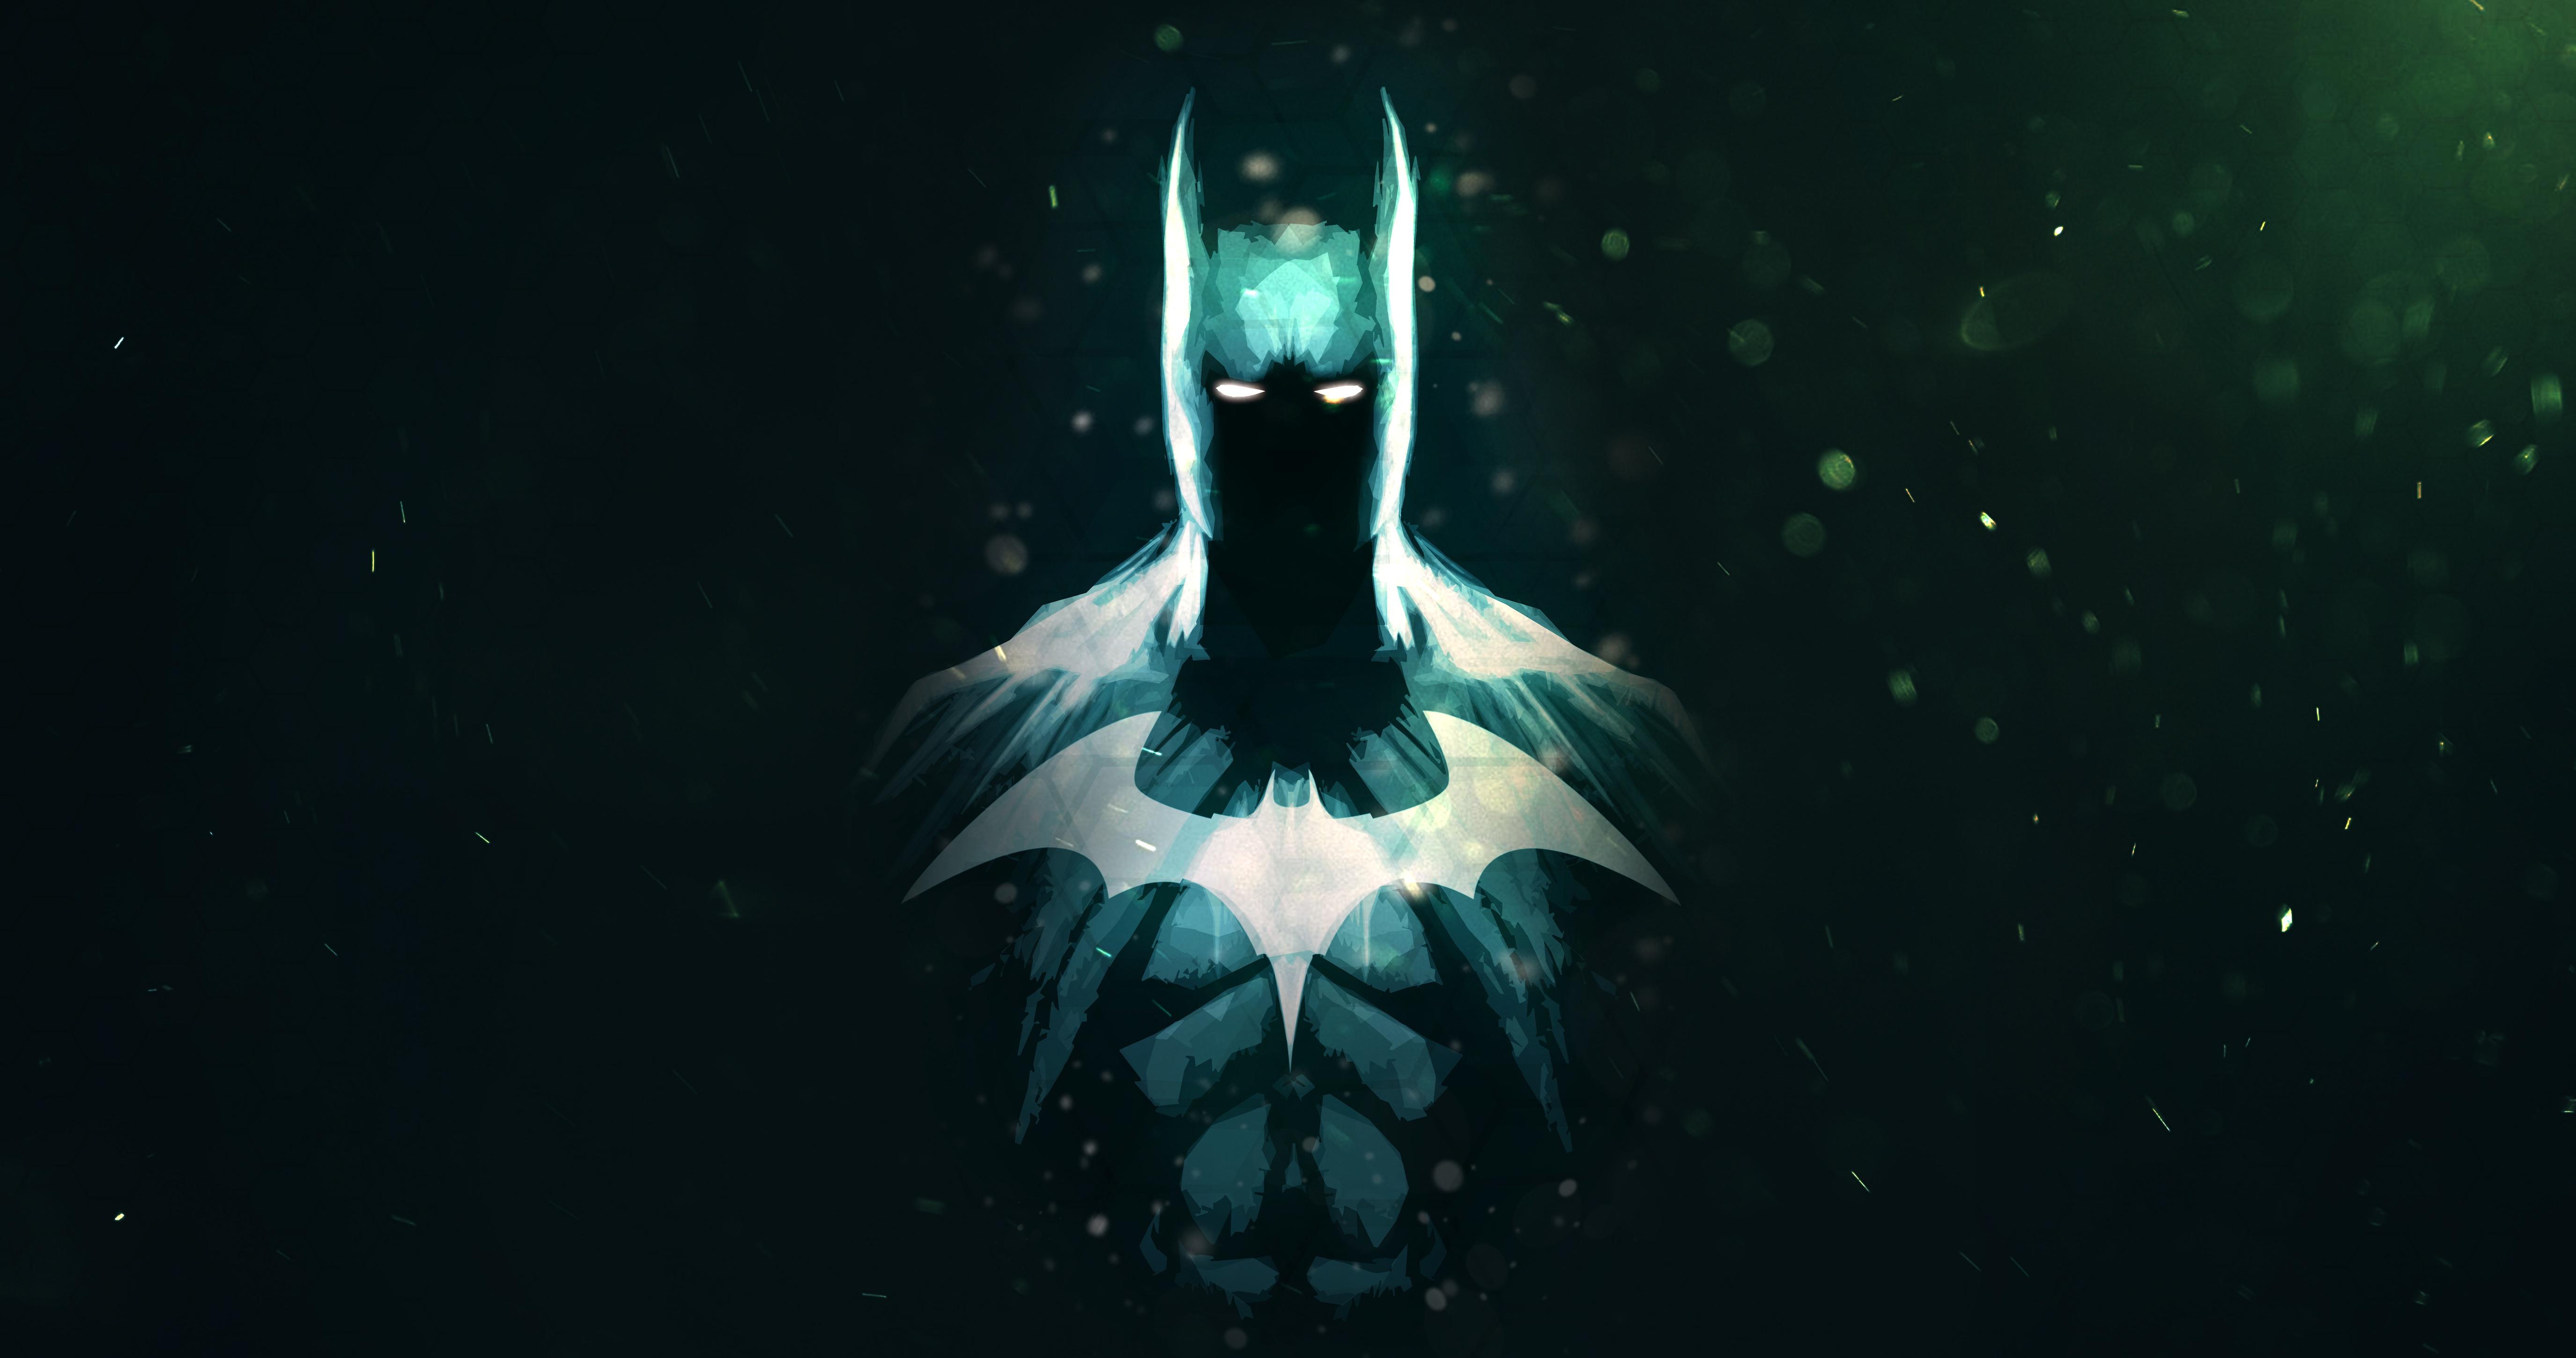 Batman Dc Comics Minimalism Artwork 5k